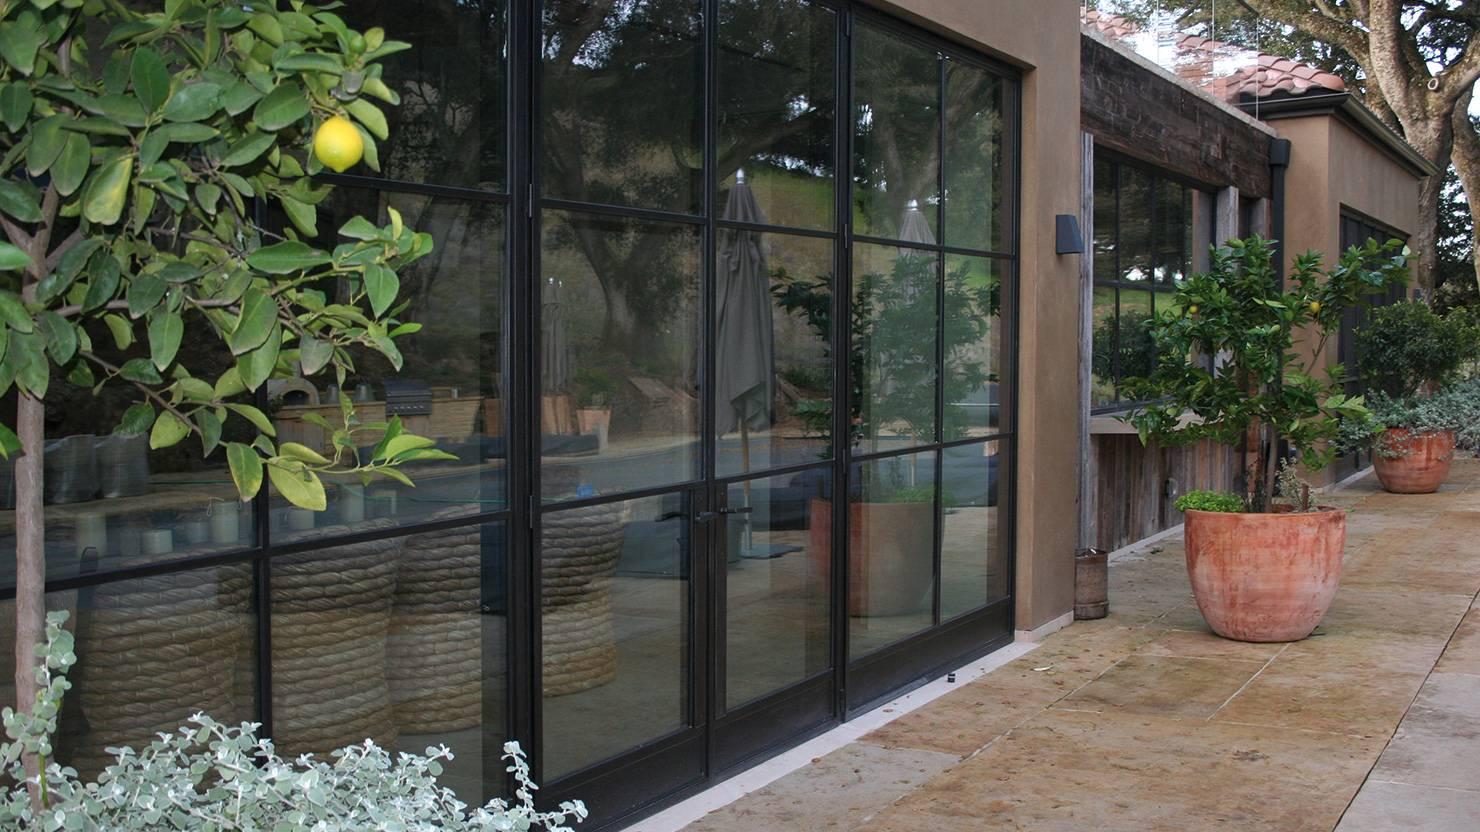 OS265-2-serramenti-acciaio-zincato-ken-linstead-architects-5_project_big